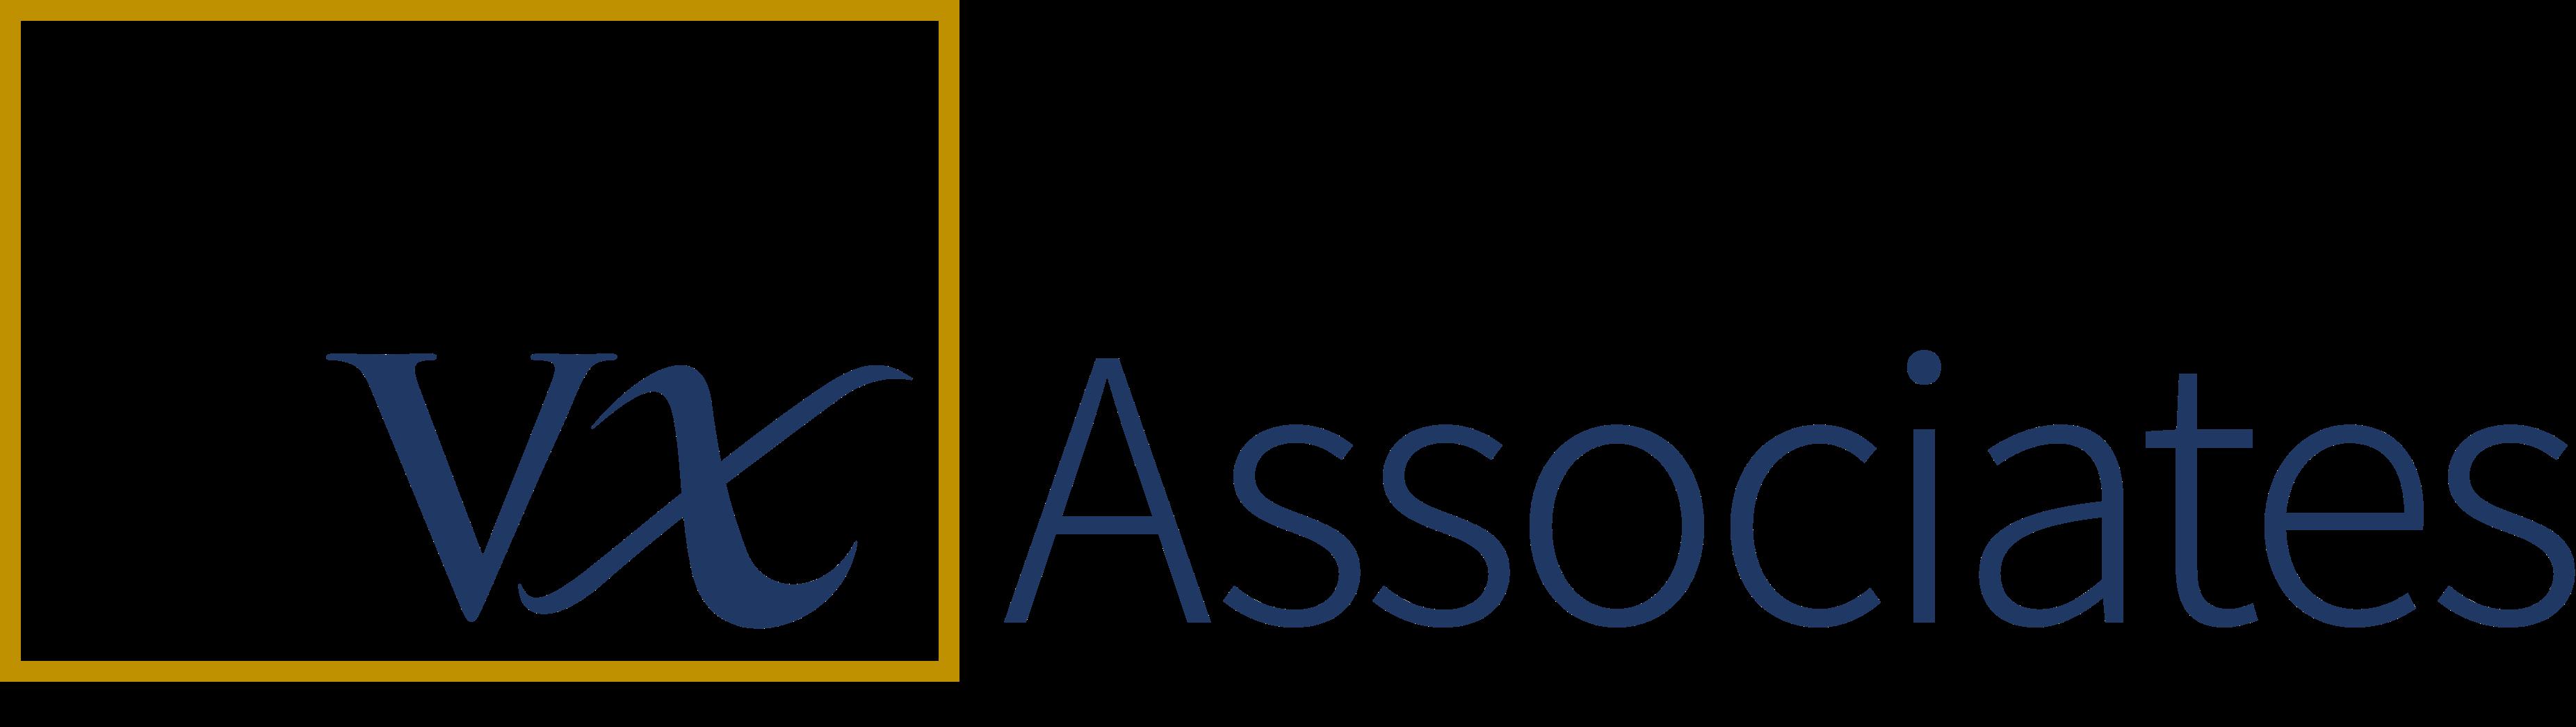 VX Associates Blue logo